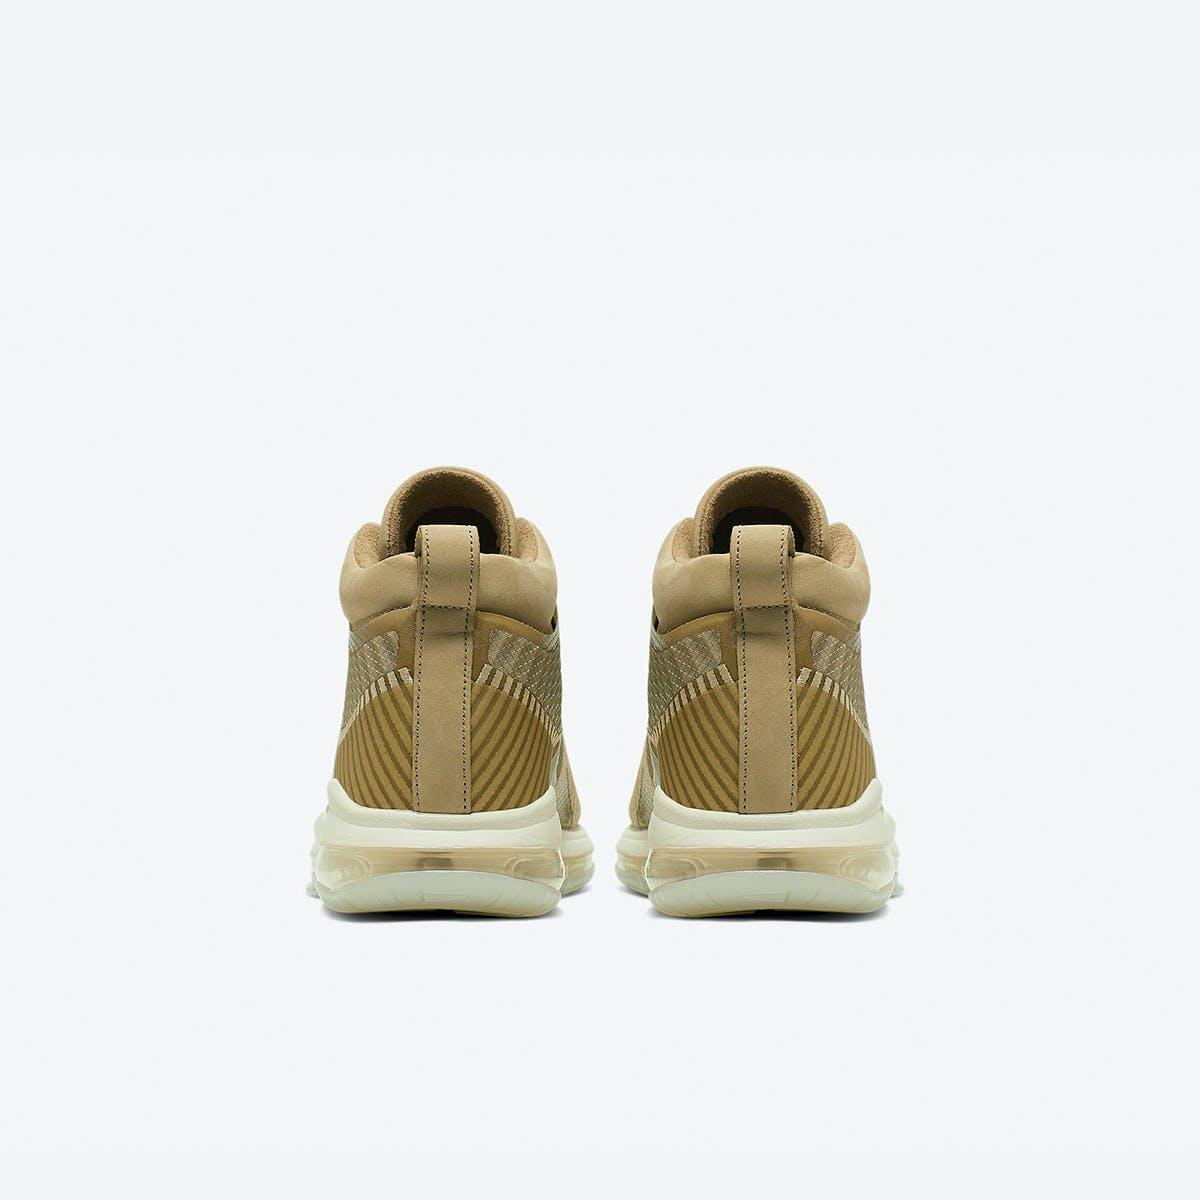 Nike x John Elliott LeBron Icon - AQ0114-200